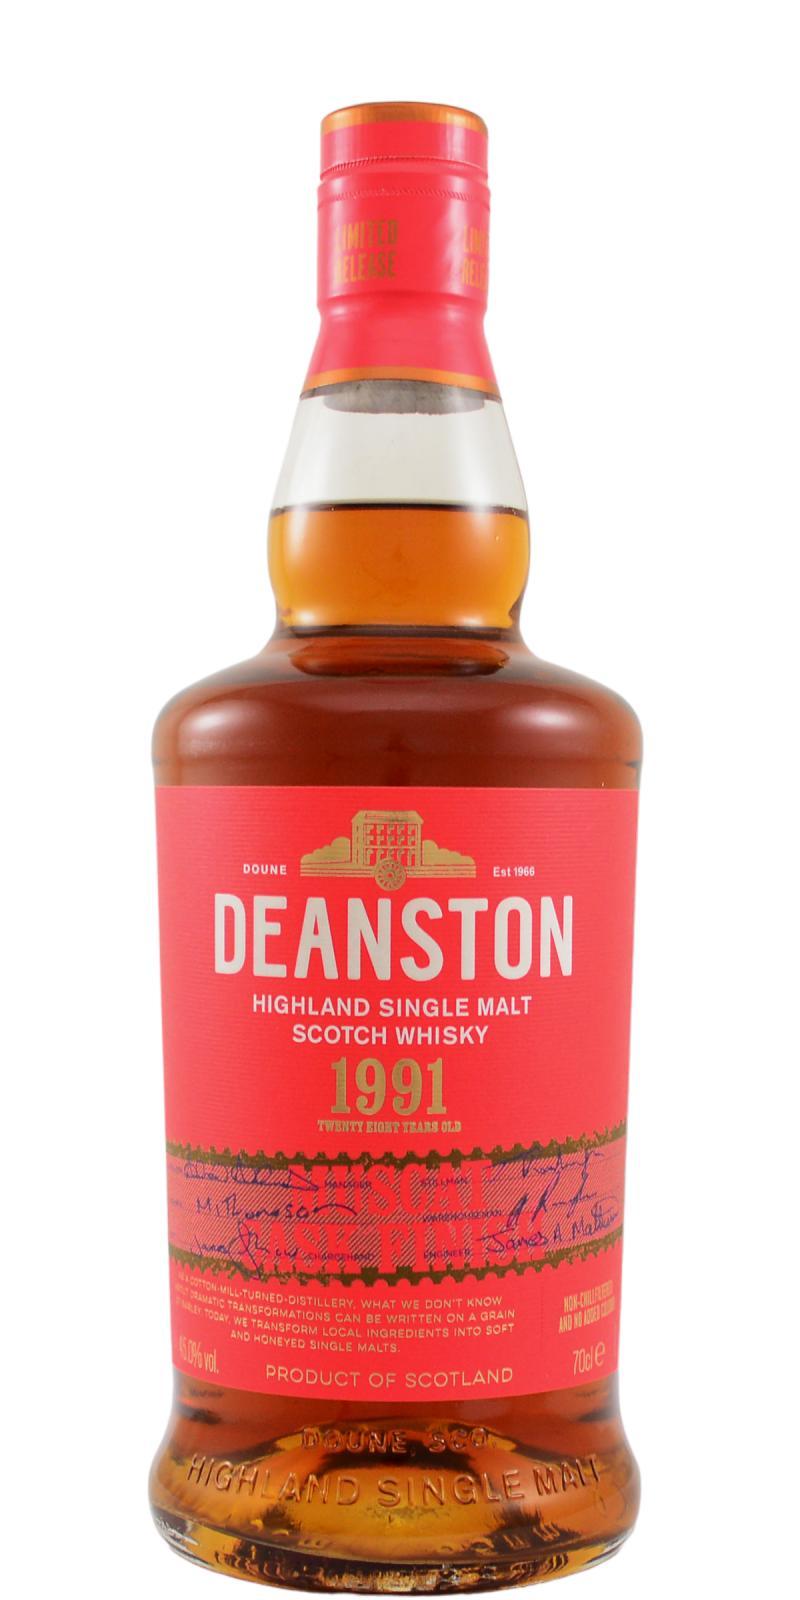 Deanston 1991